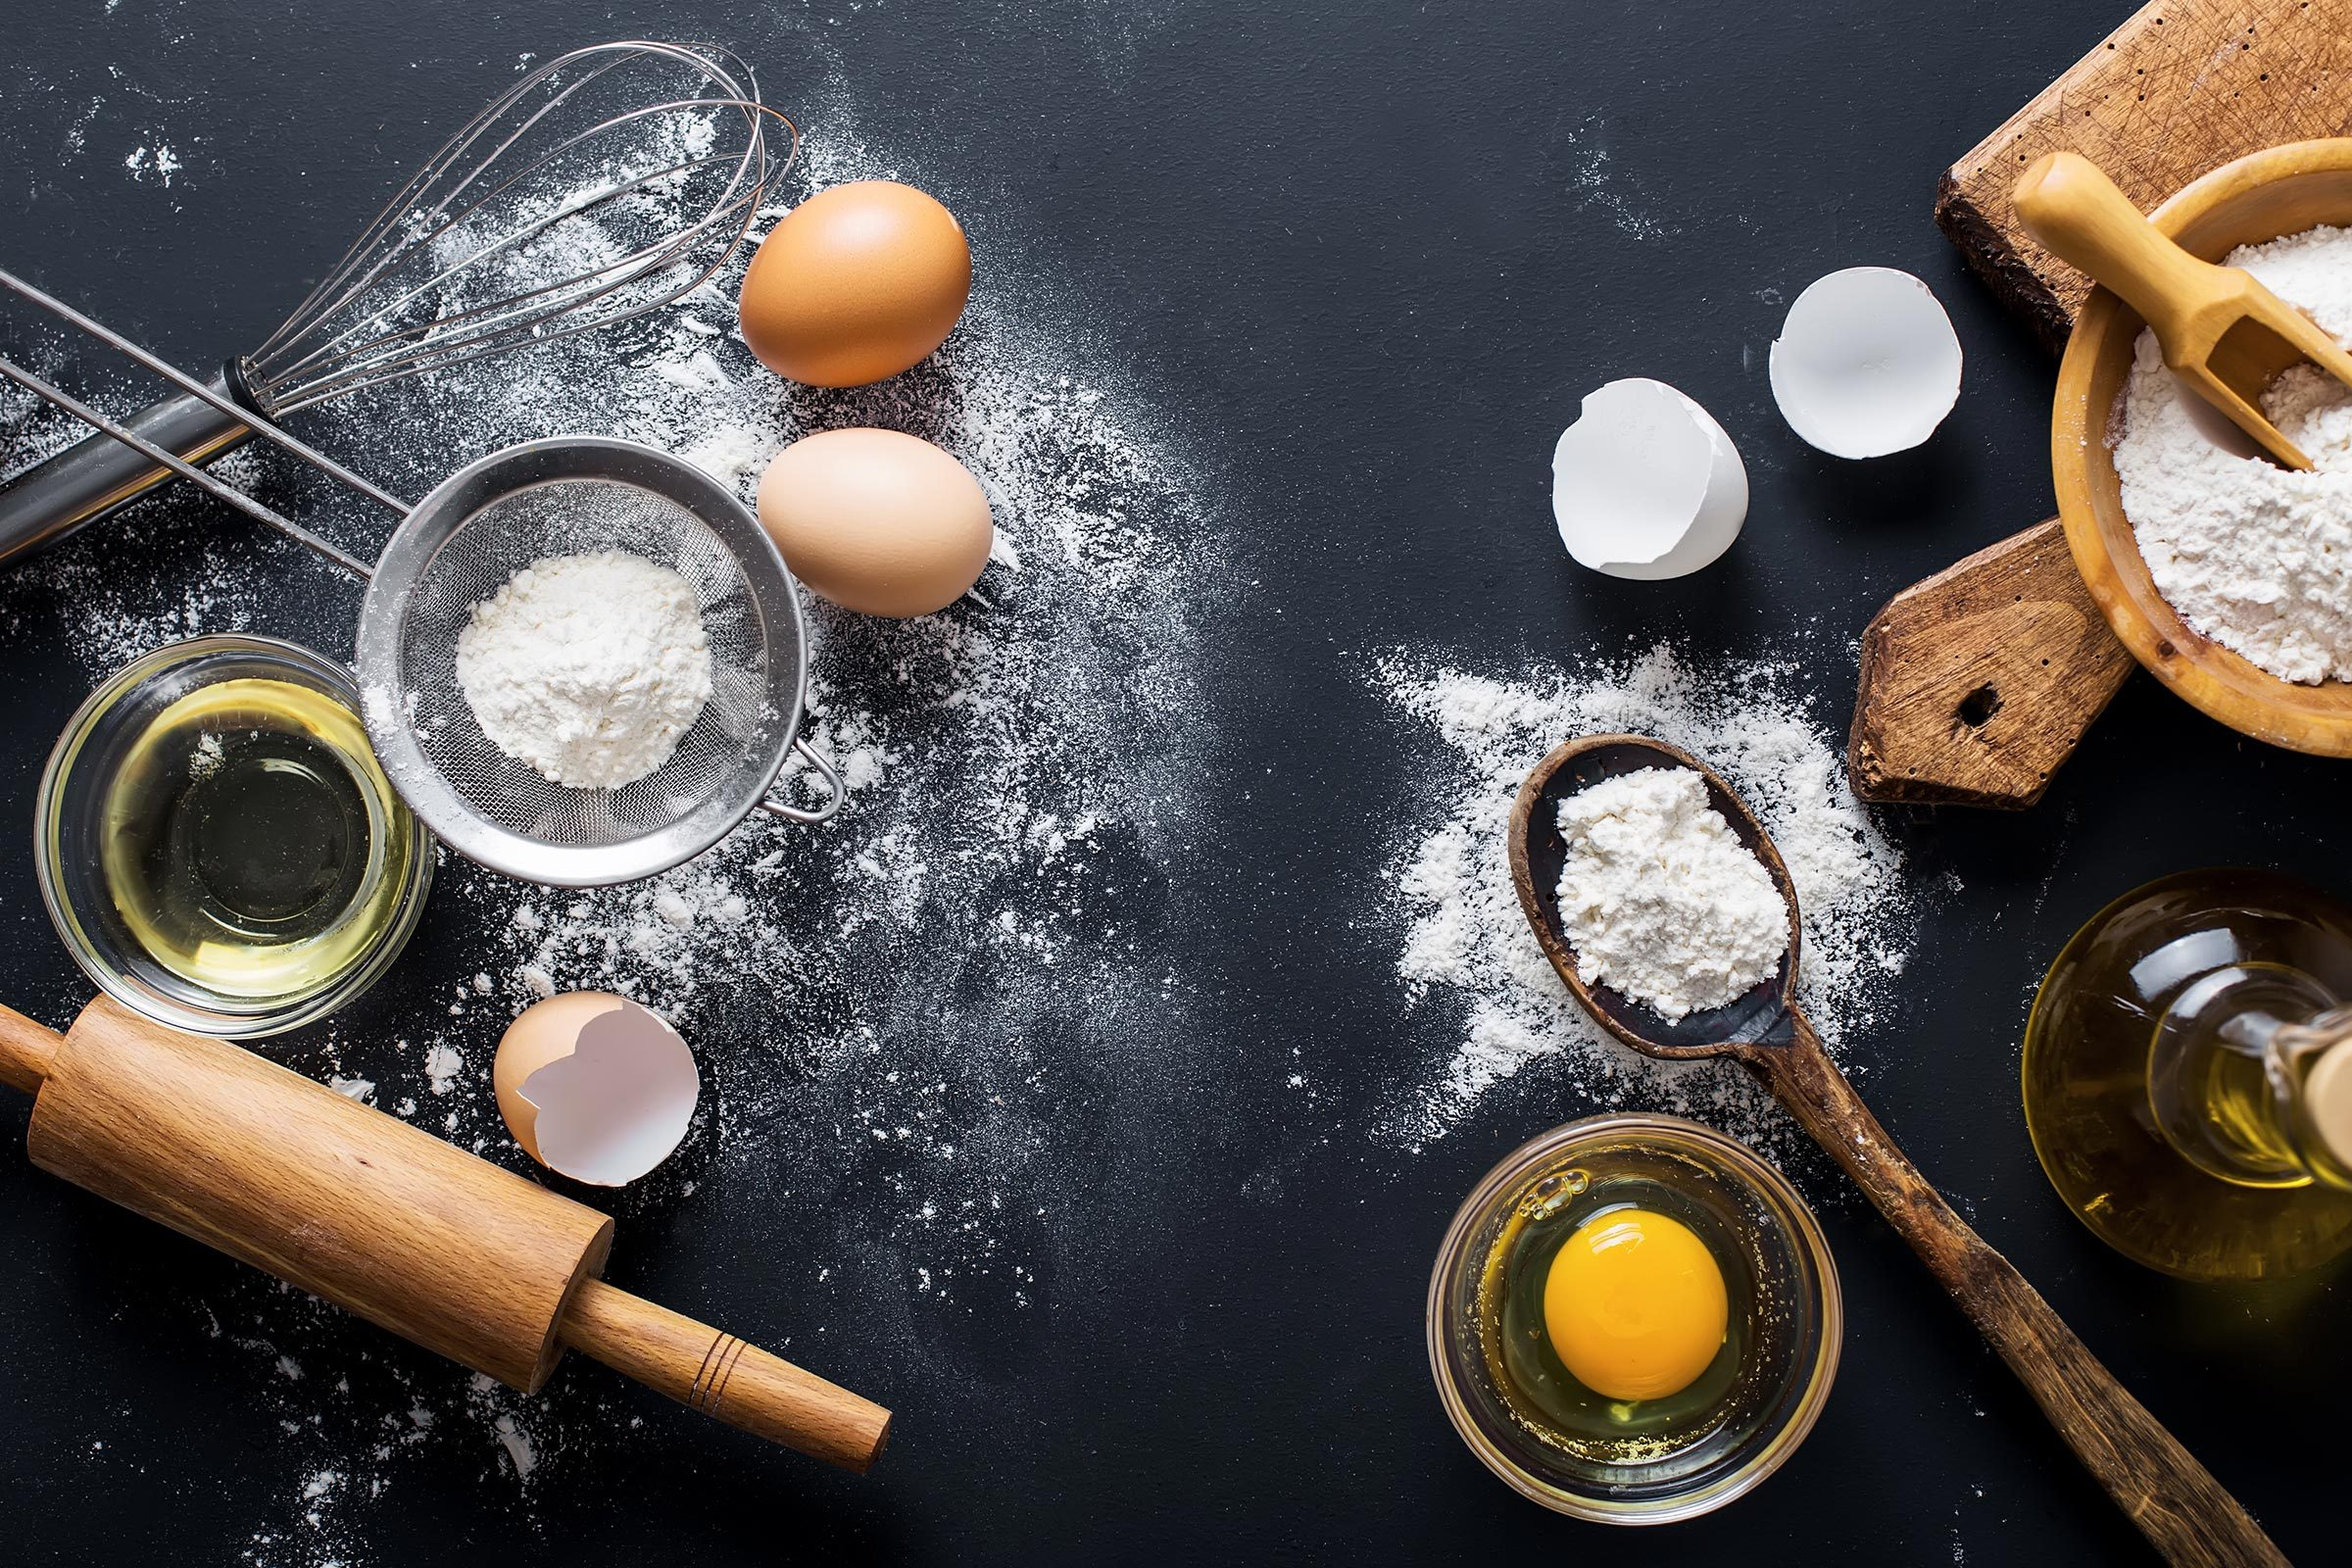 eggs, flour, baking materials